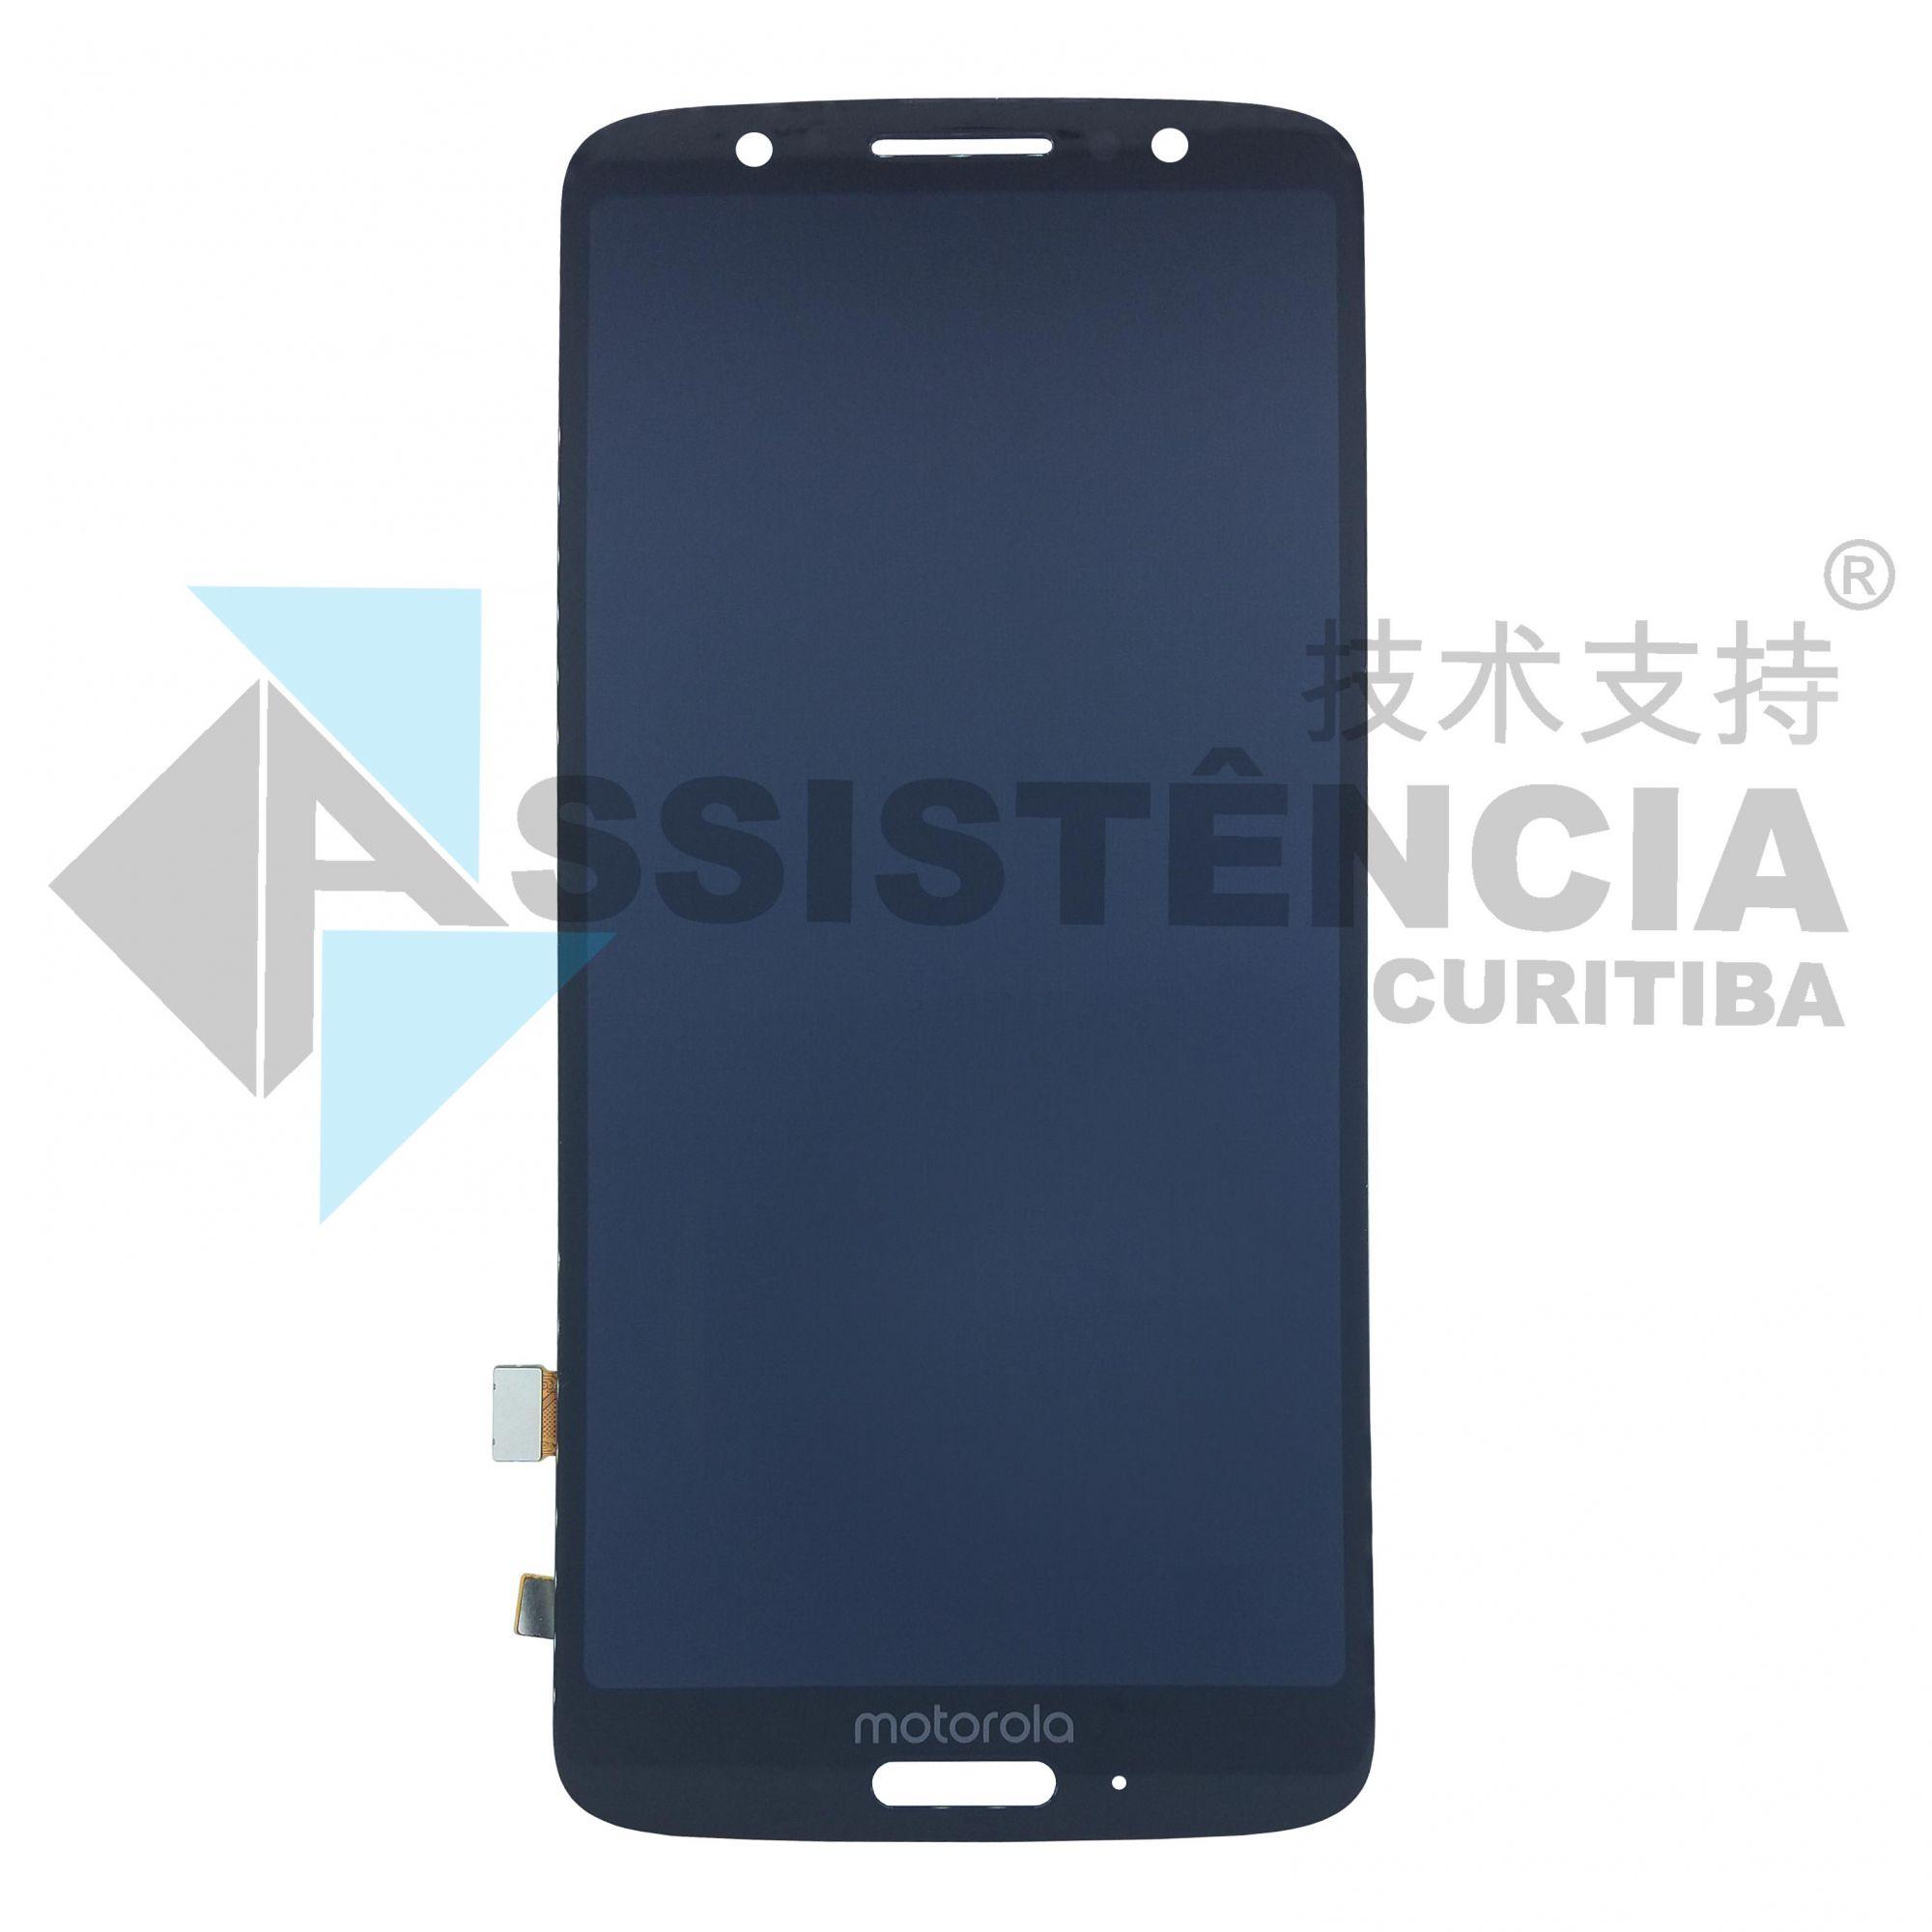 Tela Display Motorola Moto G6 Xt1925 Preto